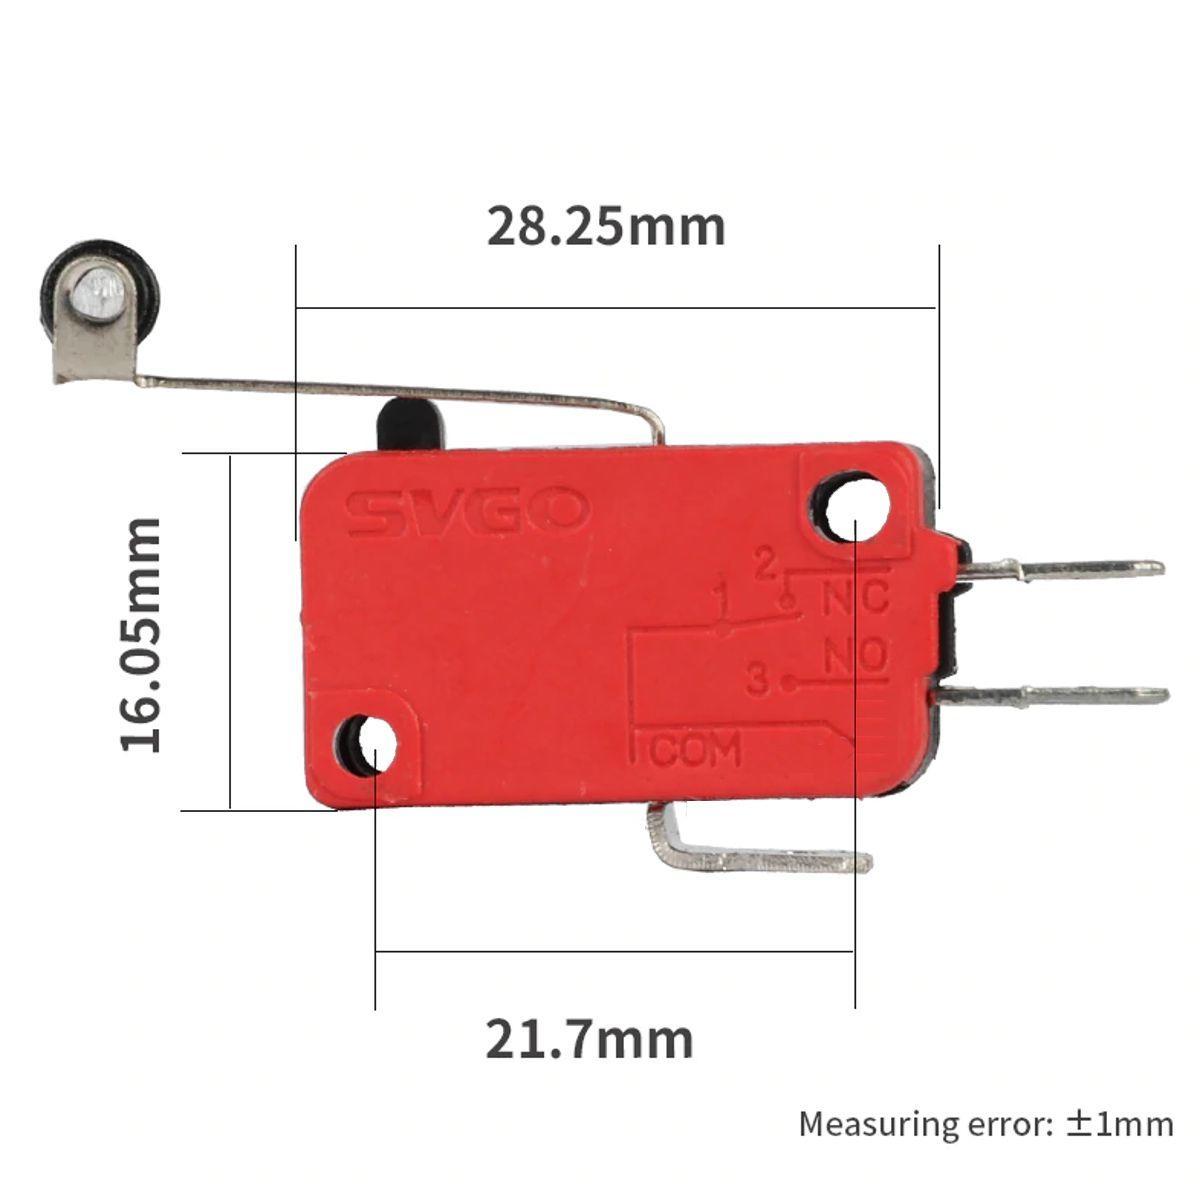 Interruptor tipo Alavanca SVGO SV-166-1C25 (3~16A / 250VAC)